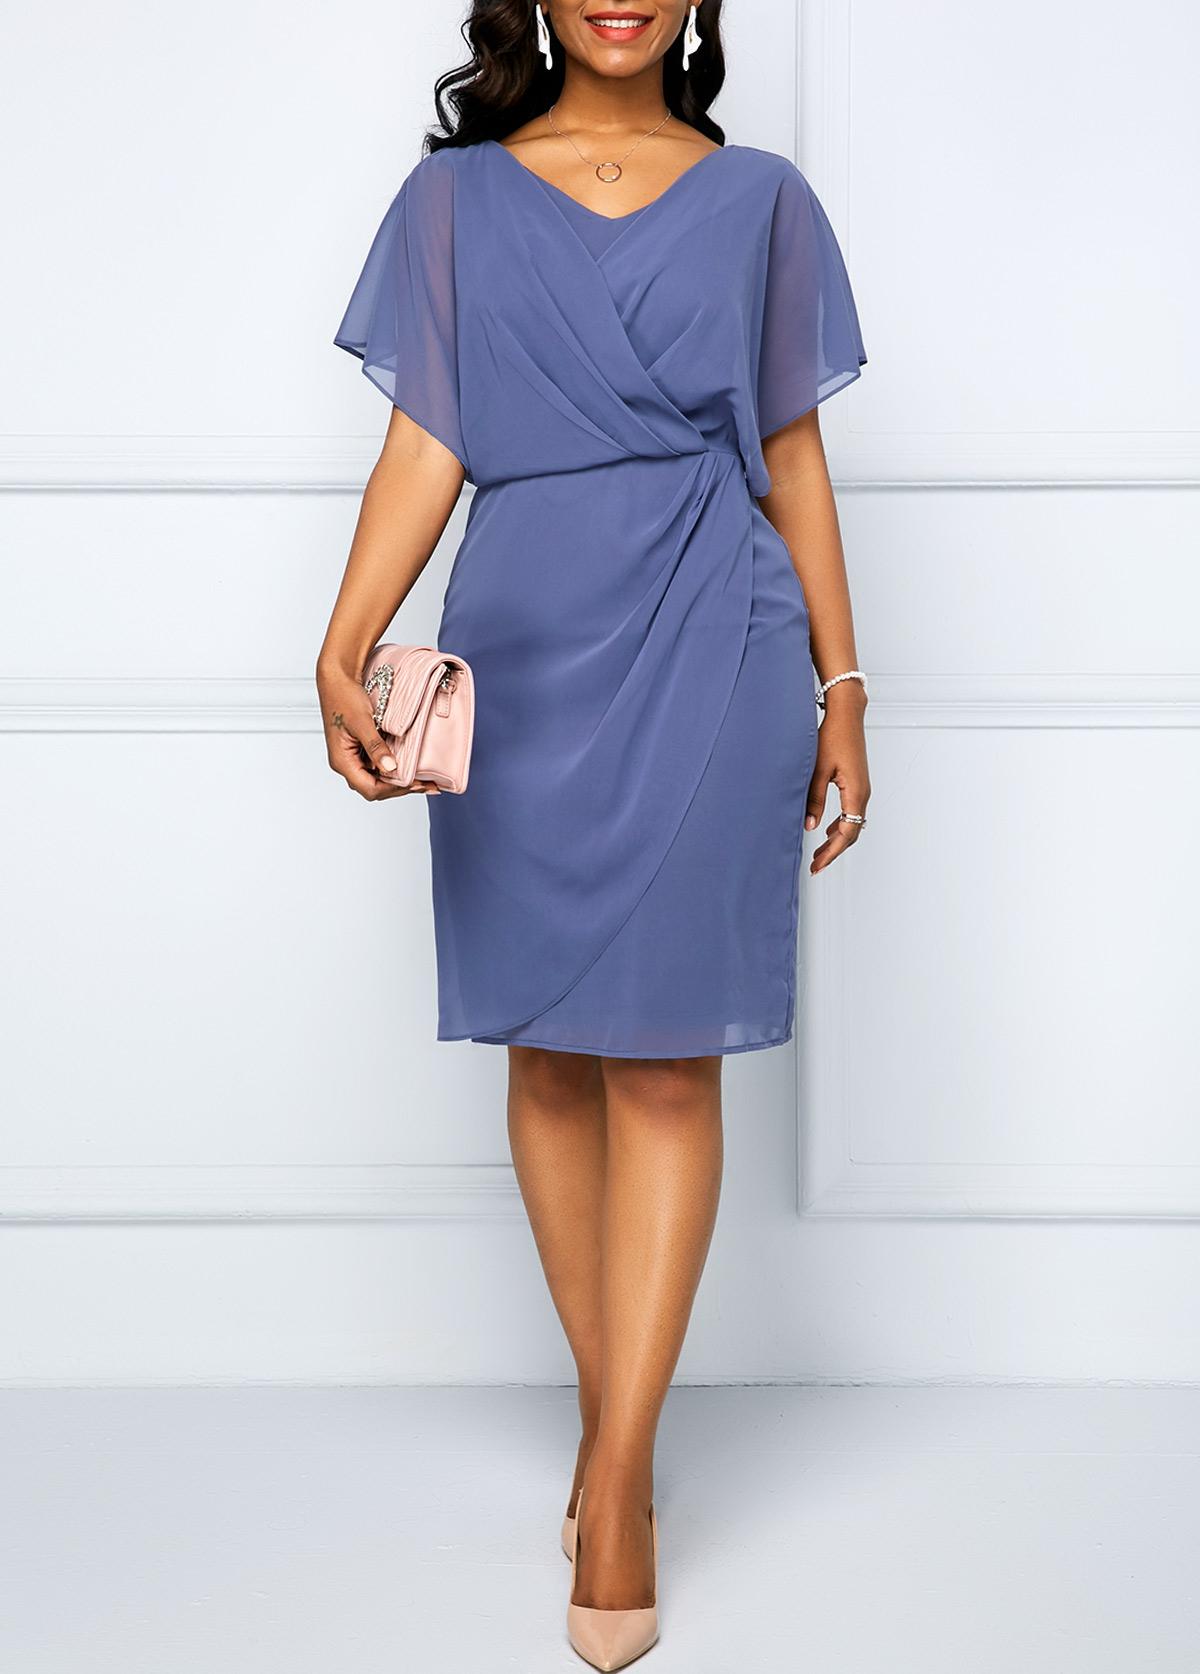 Dusty Blue Cape Shoulder Draped Surplice Chiffon Dress